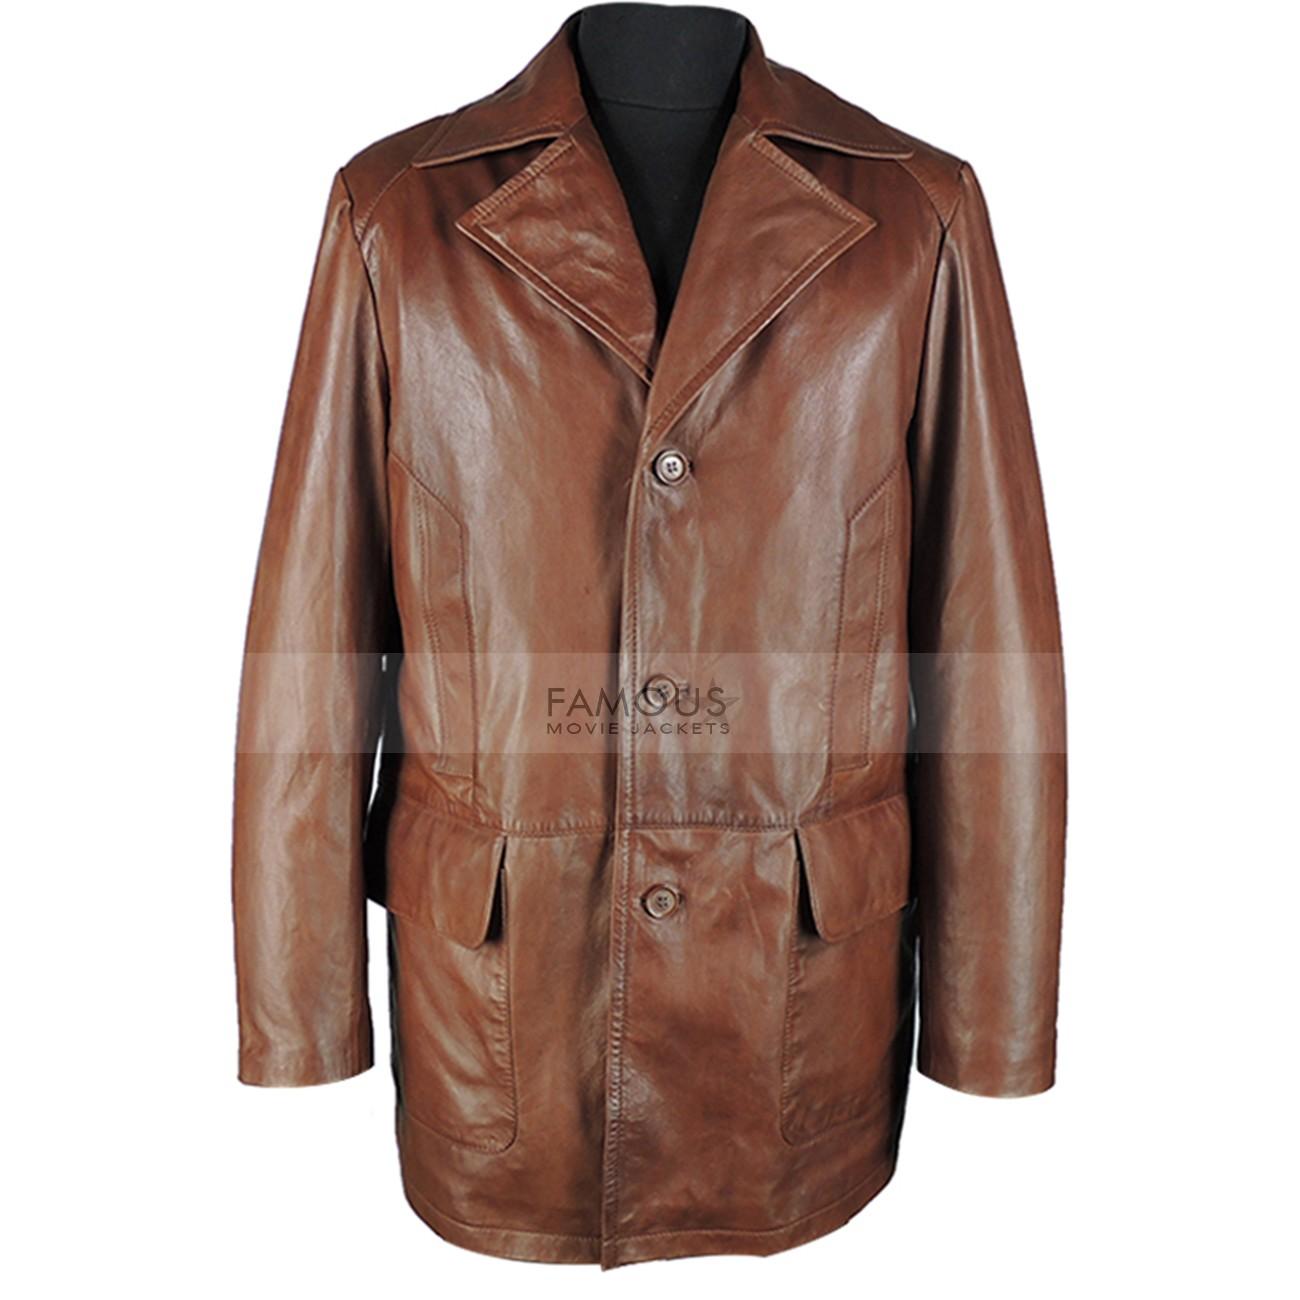 Donnie Brasco Johnny Depp Jacket